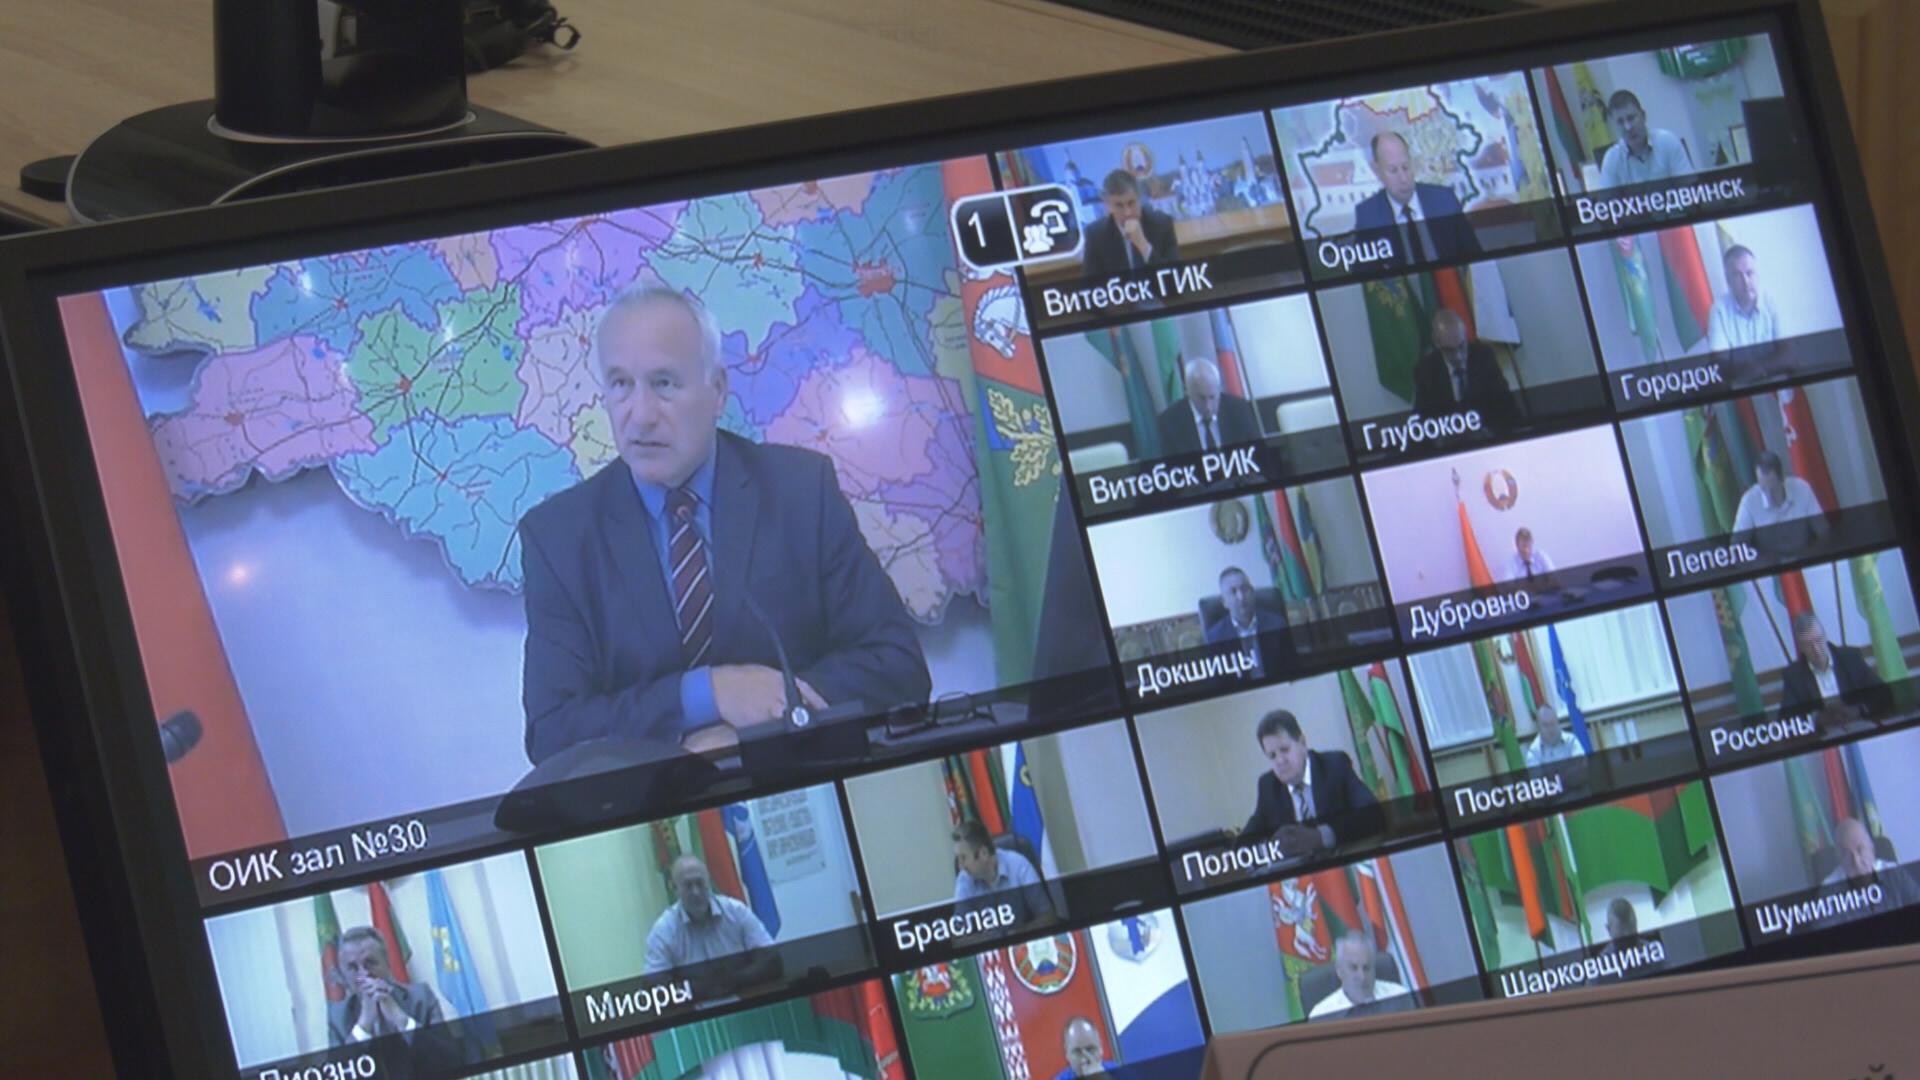 prjamaja linija guber - Николай Шерстнёв провёл прямую линию с жителями области (видео)